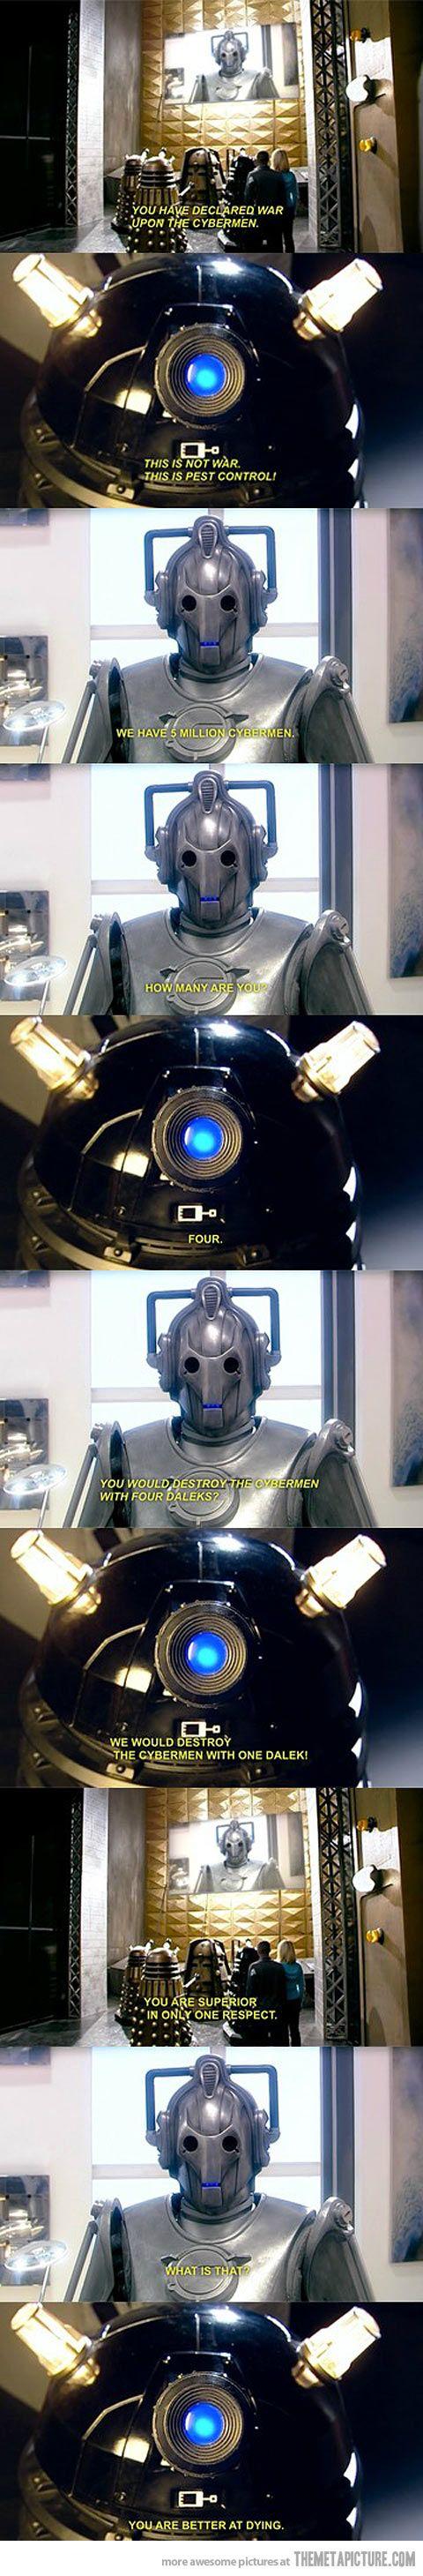 I love Daleks!